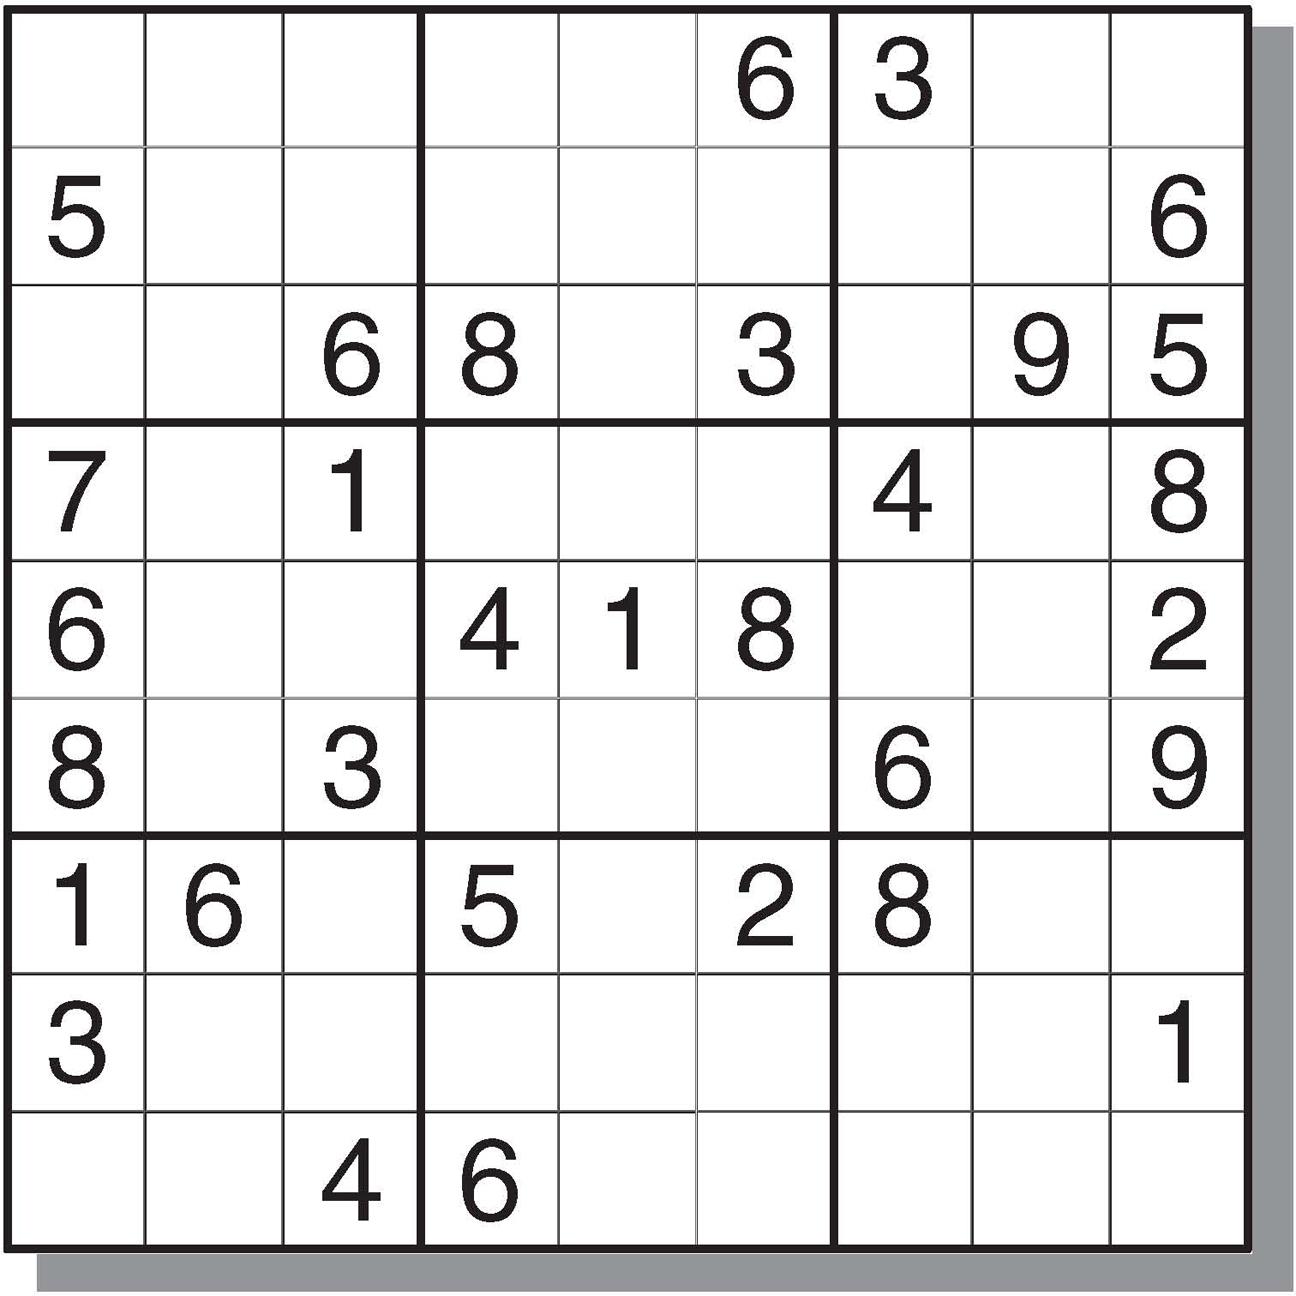 12 Best Photos Of Printable Sudoku Sheets - Printable Sudoku Puzzles - Printable Sudoku Puzzle With Answer Key